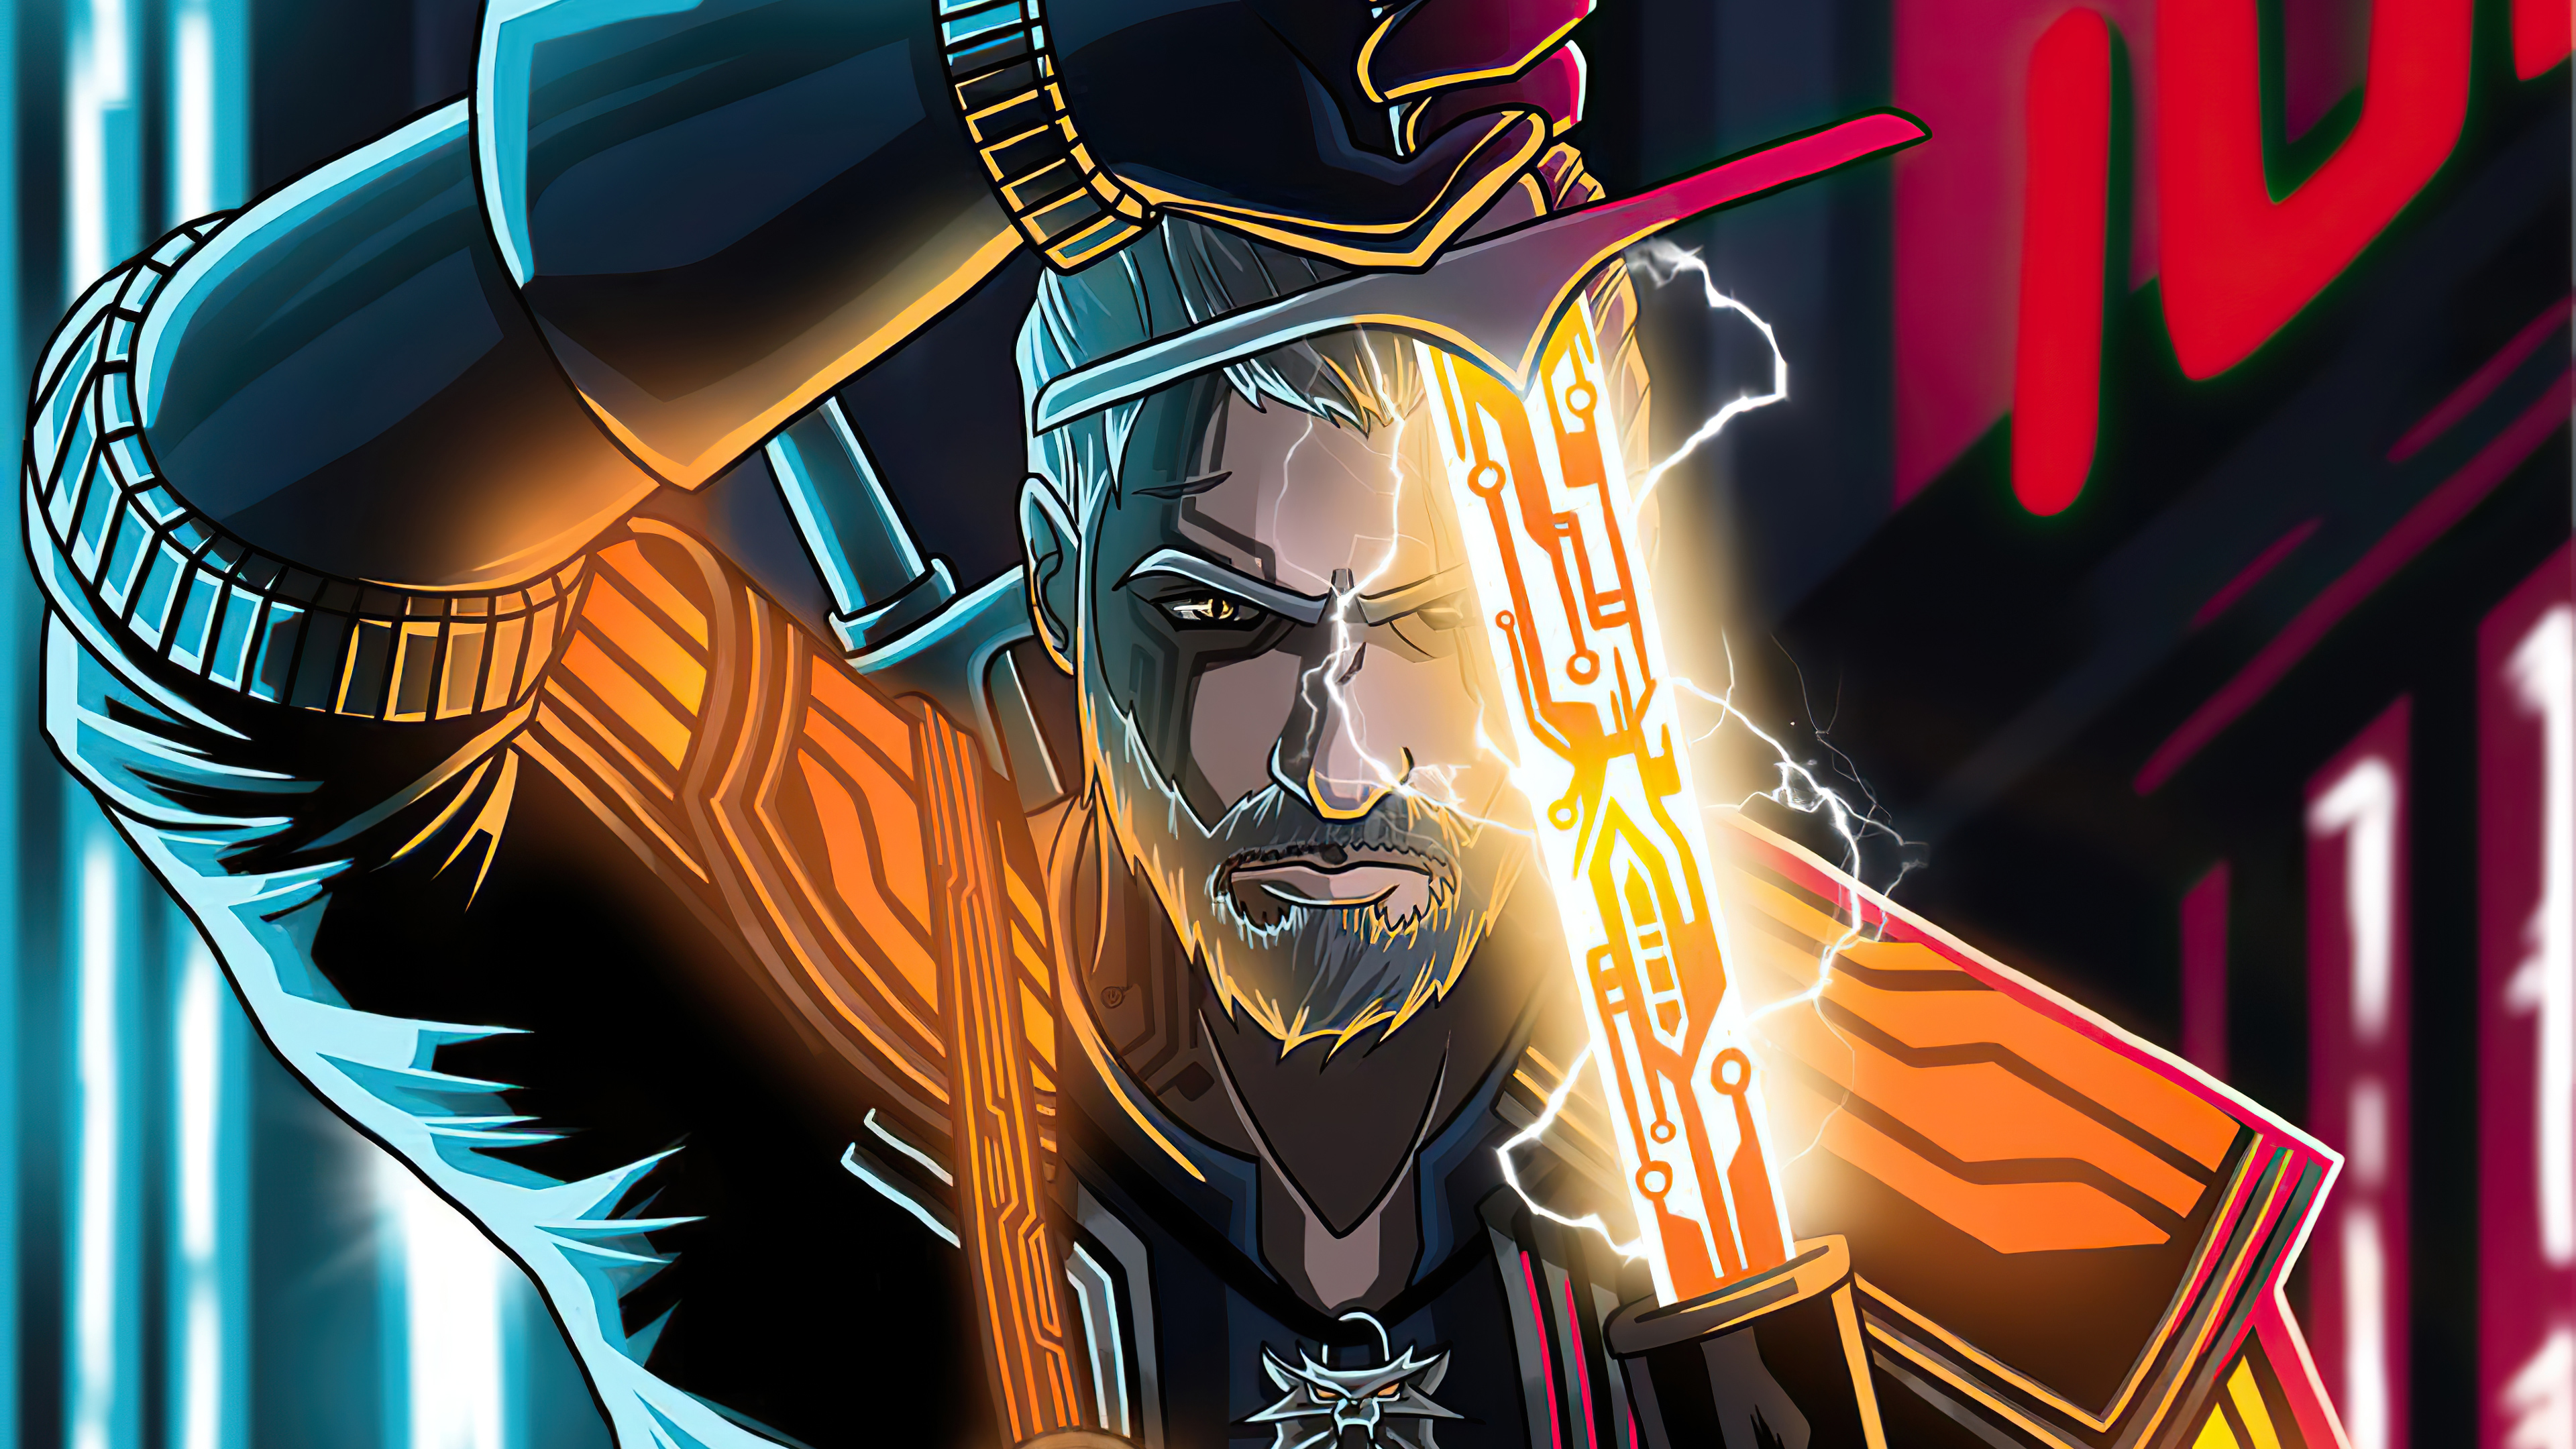 Fondos de pantalla Geralt de Rivia estilo Cyberpunk 2077